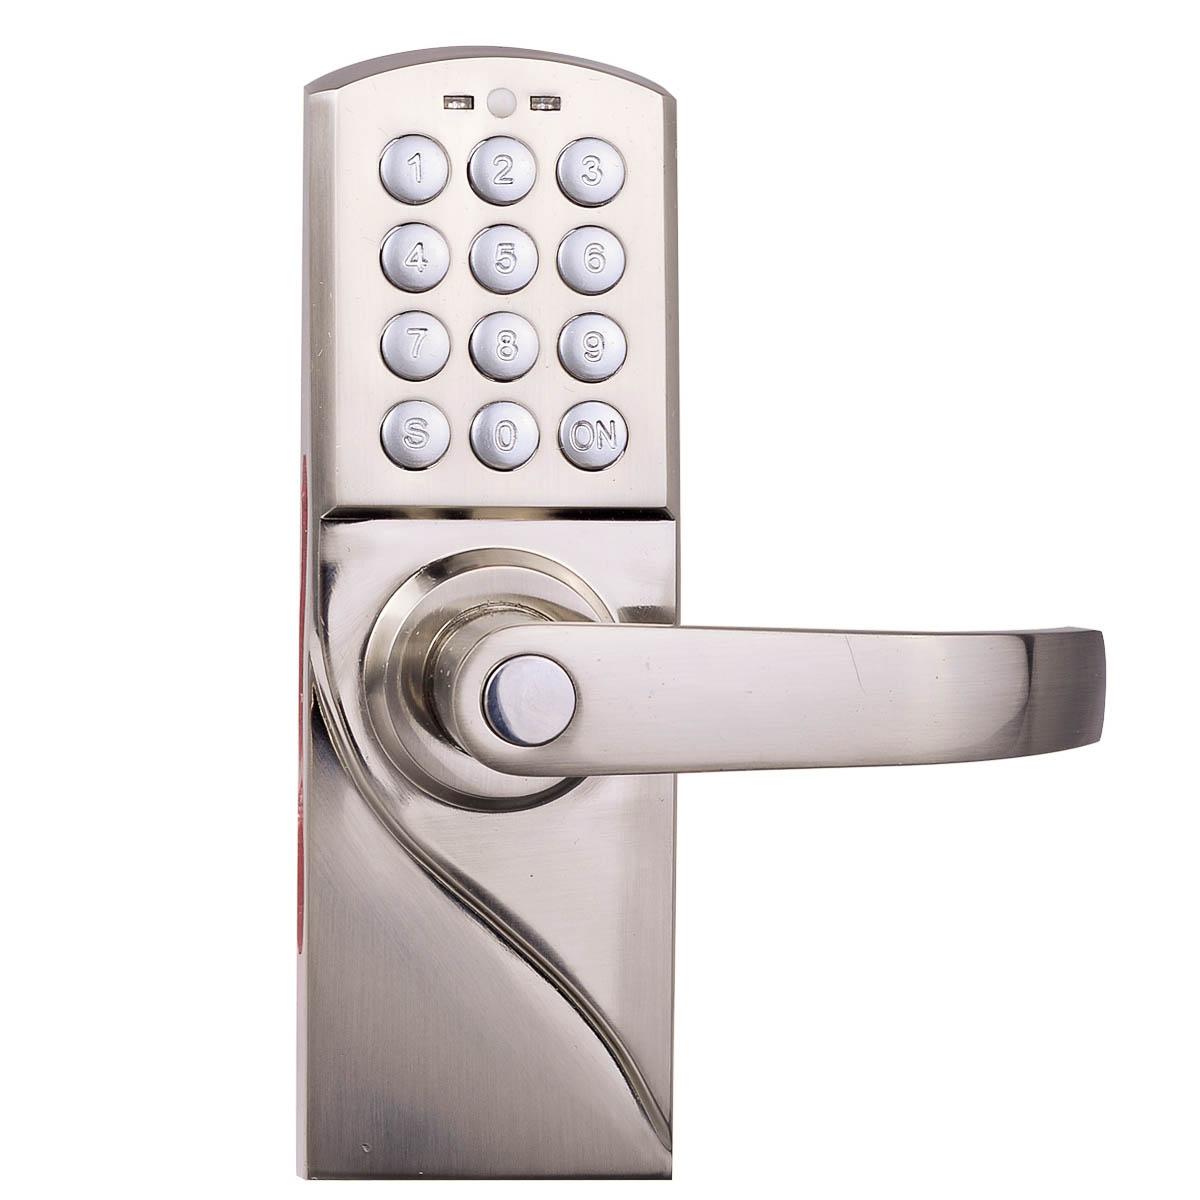 keyless door knob photo - 3